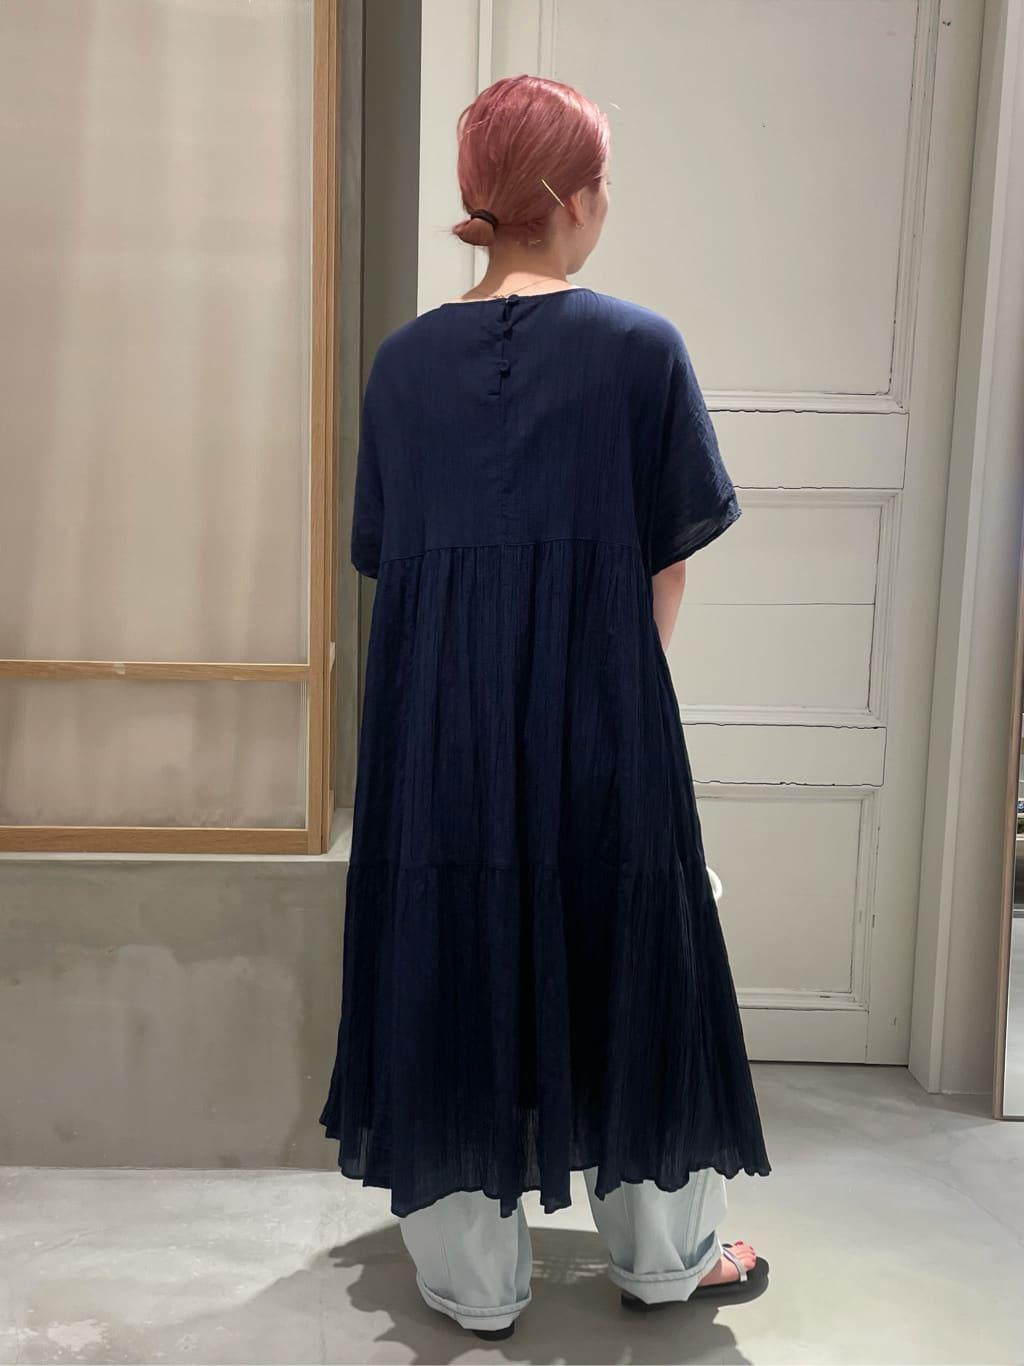 bulle de savon 渋谷スクランブルスクエア 身長:154cm 2021.06.15